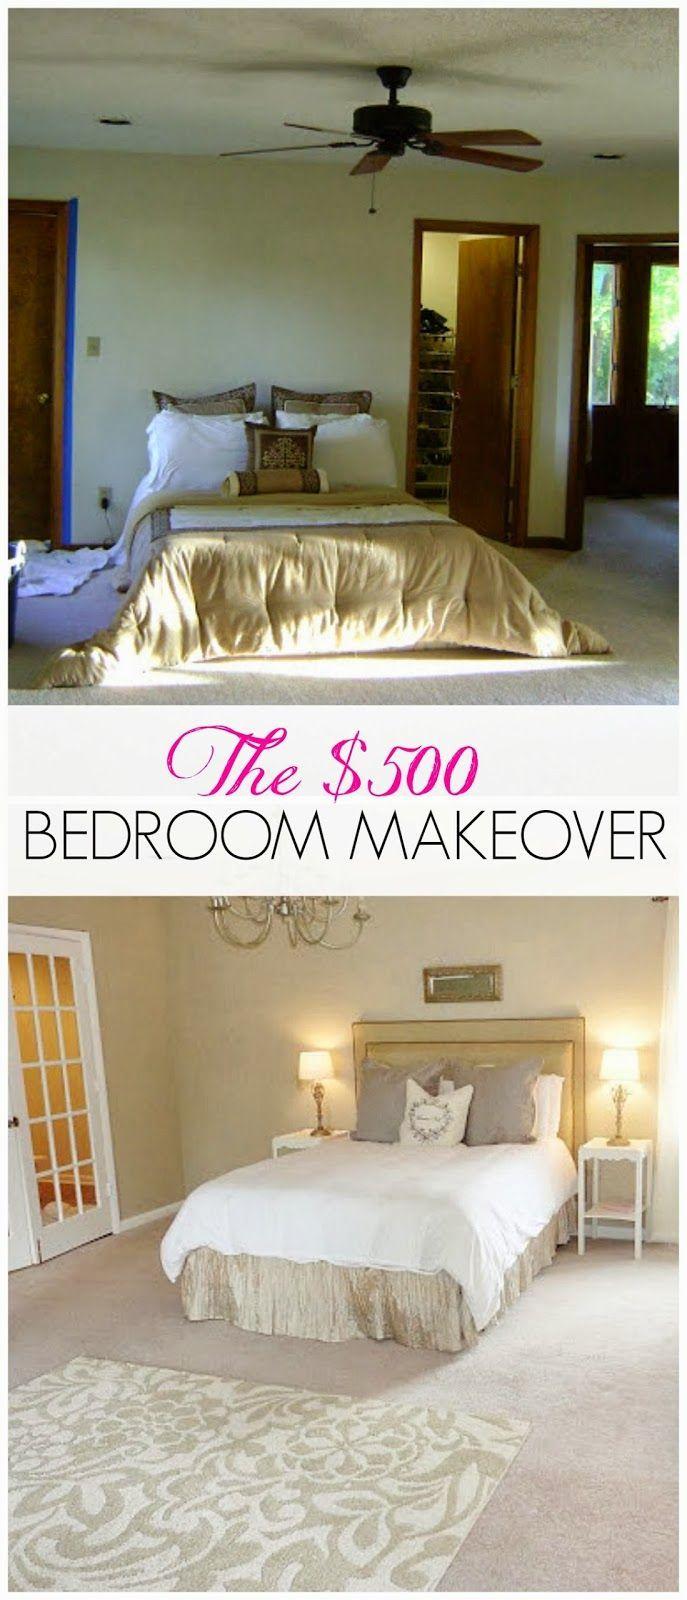 Best 25+ Budget bedroom ideas on Pinterest   DIY crafts decorate ...